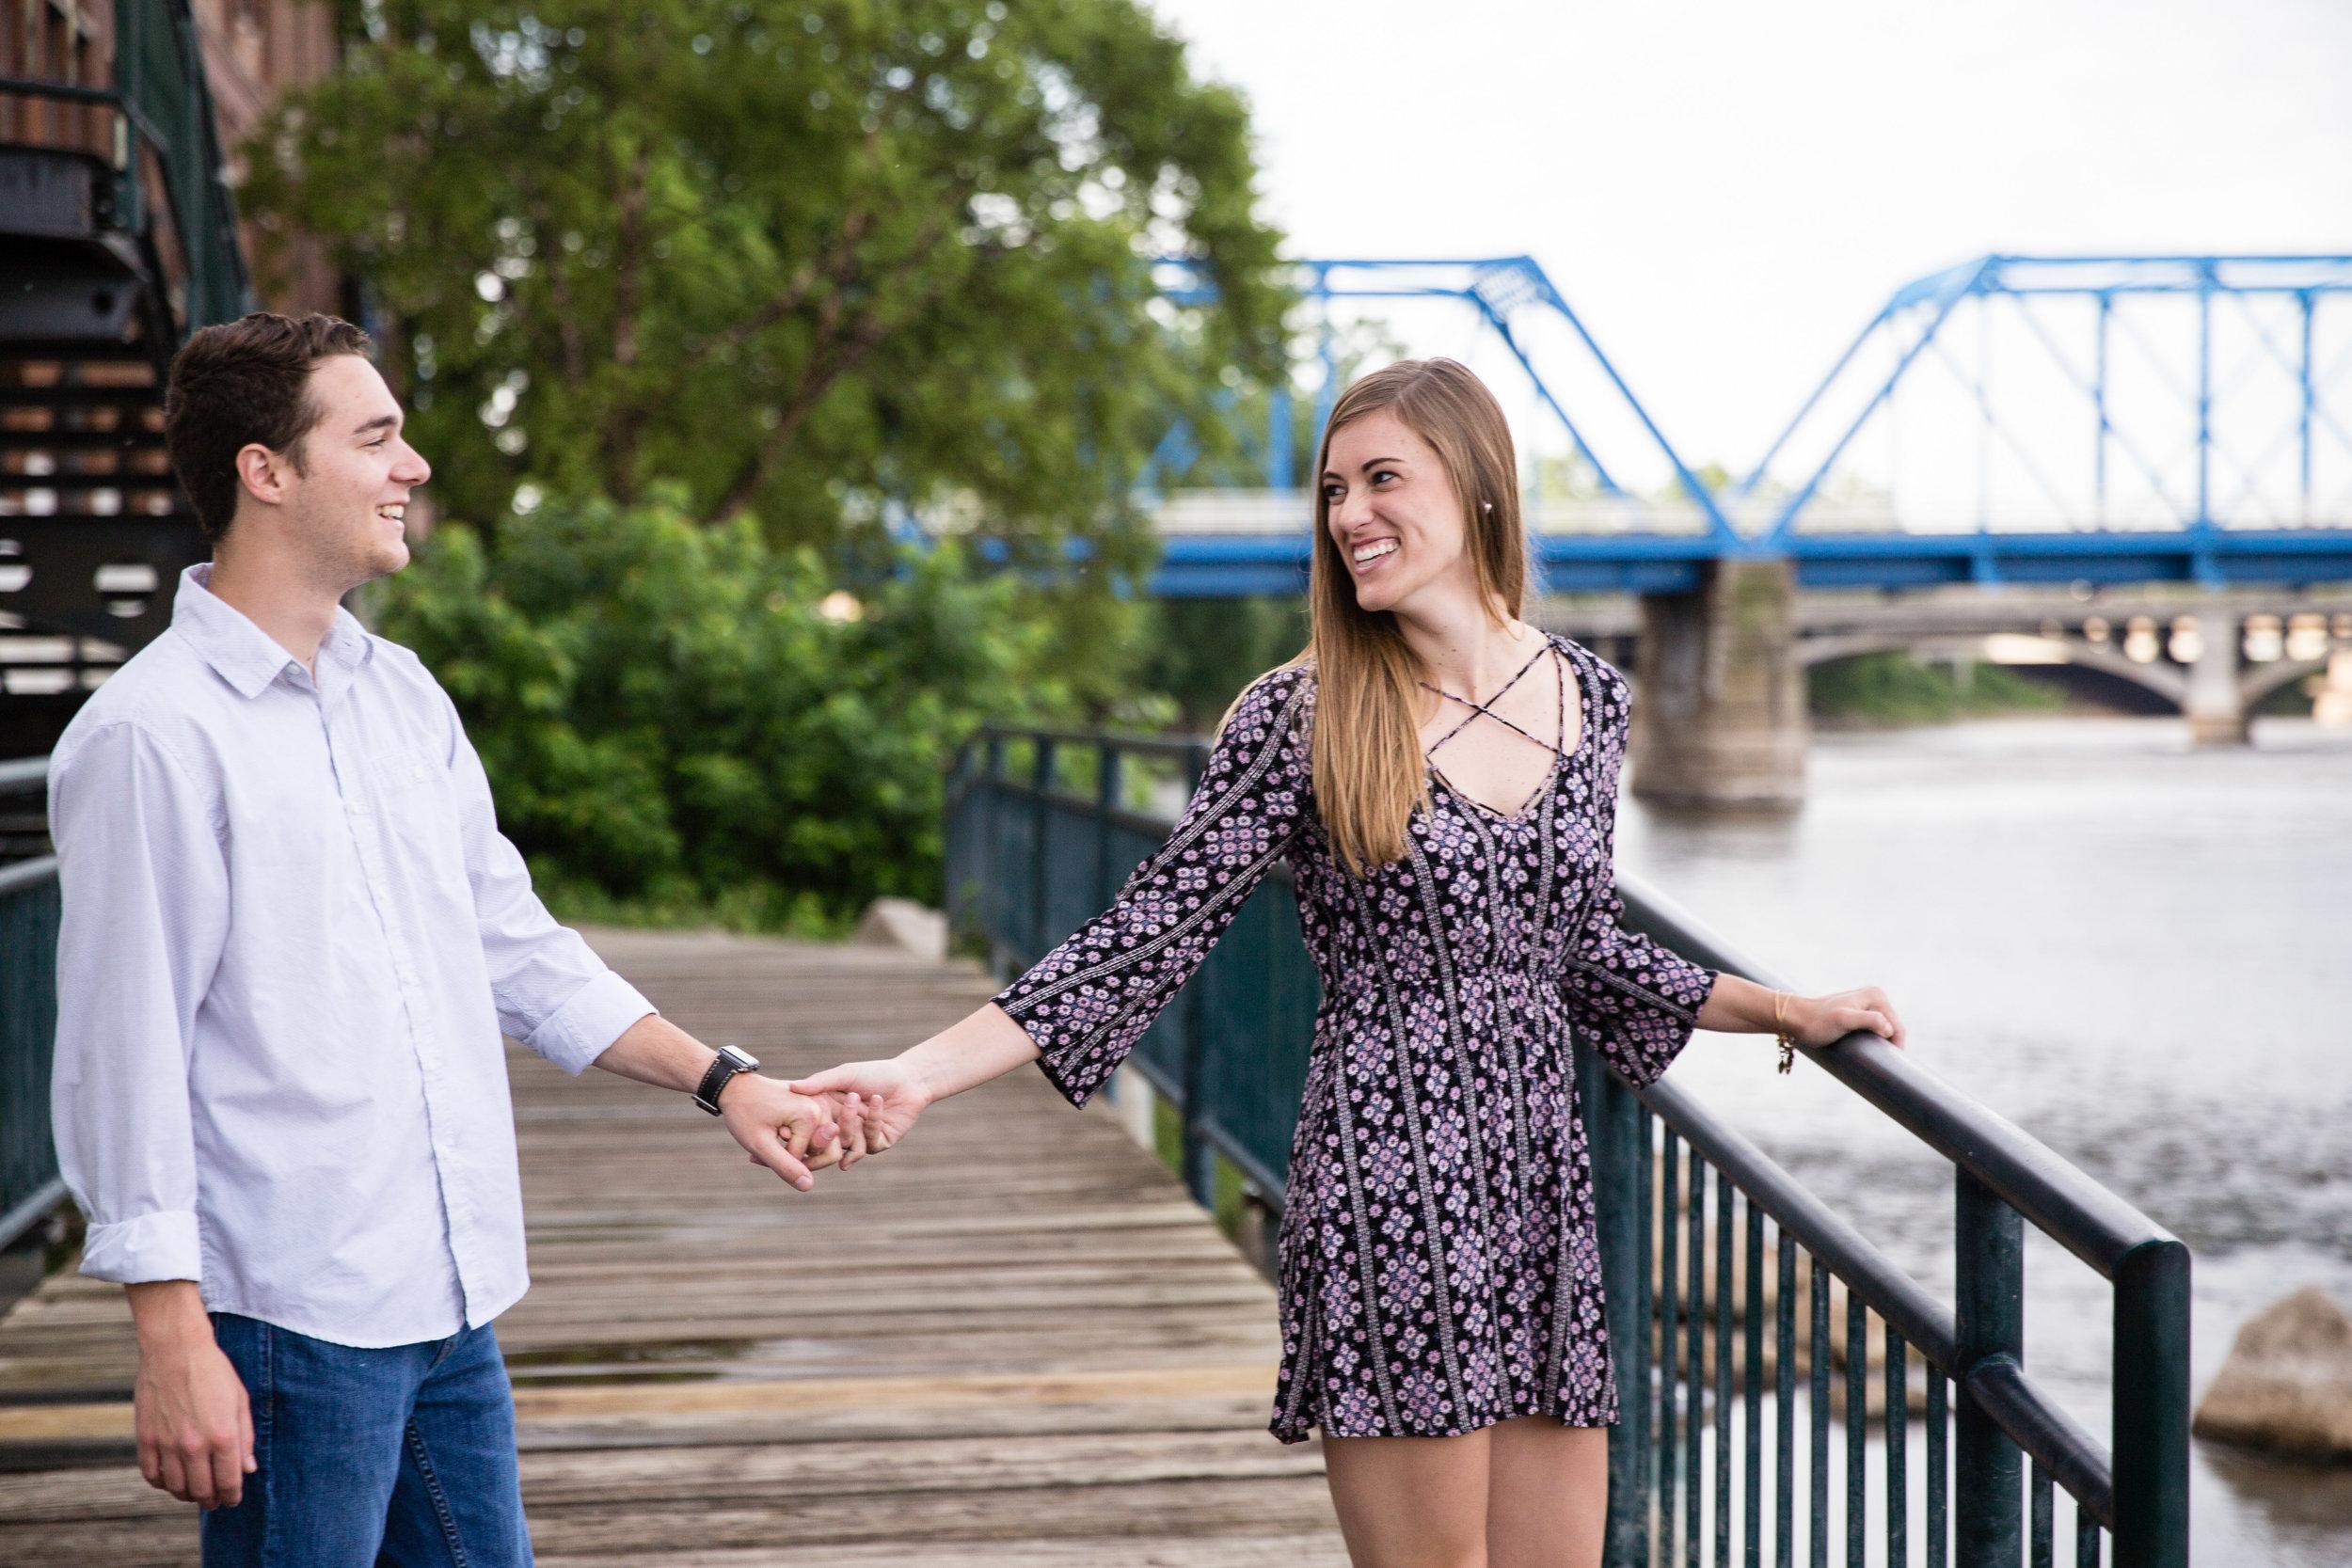 Fun Grand Rapids Couple Holding Hands_Tania Howard Photography.jpg